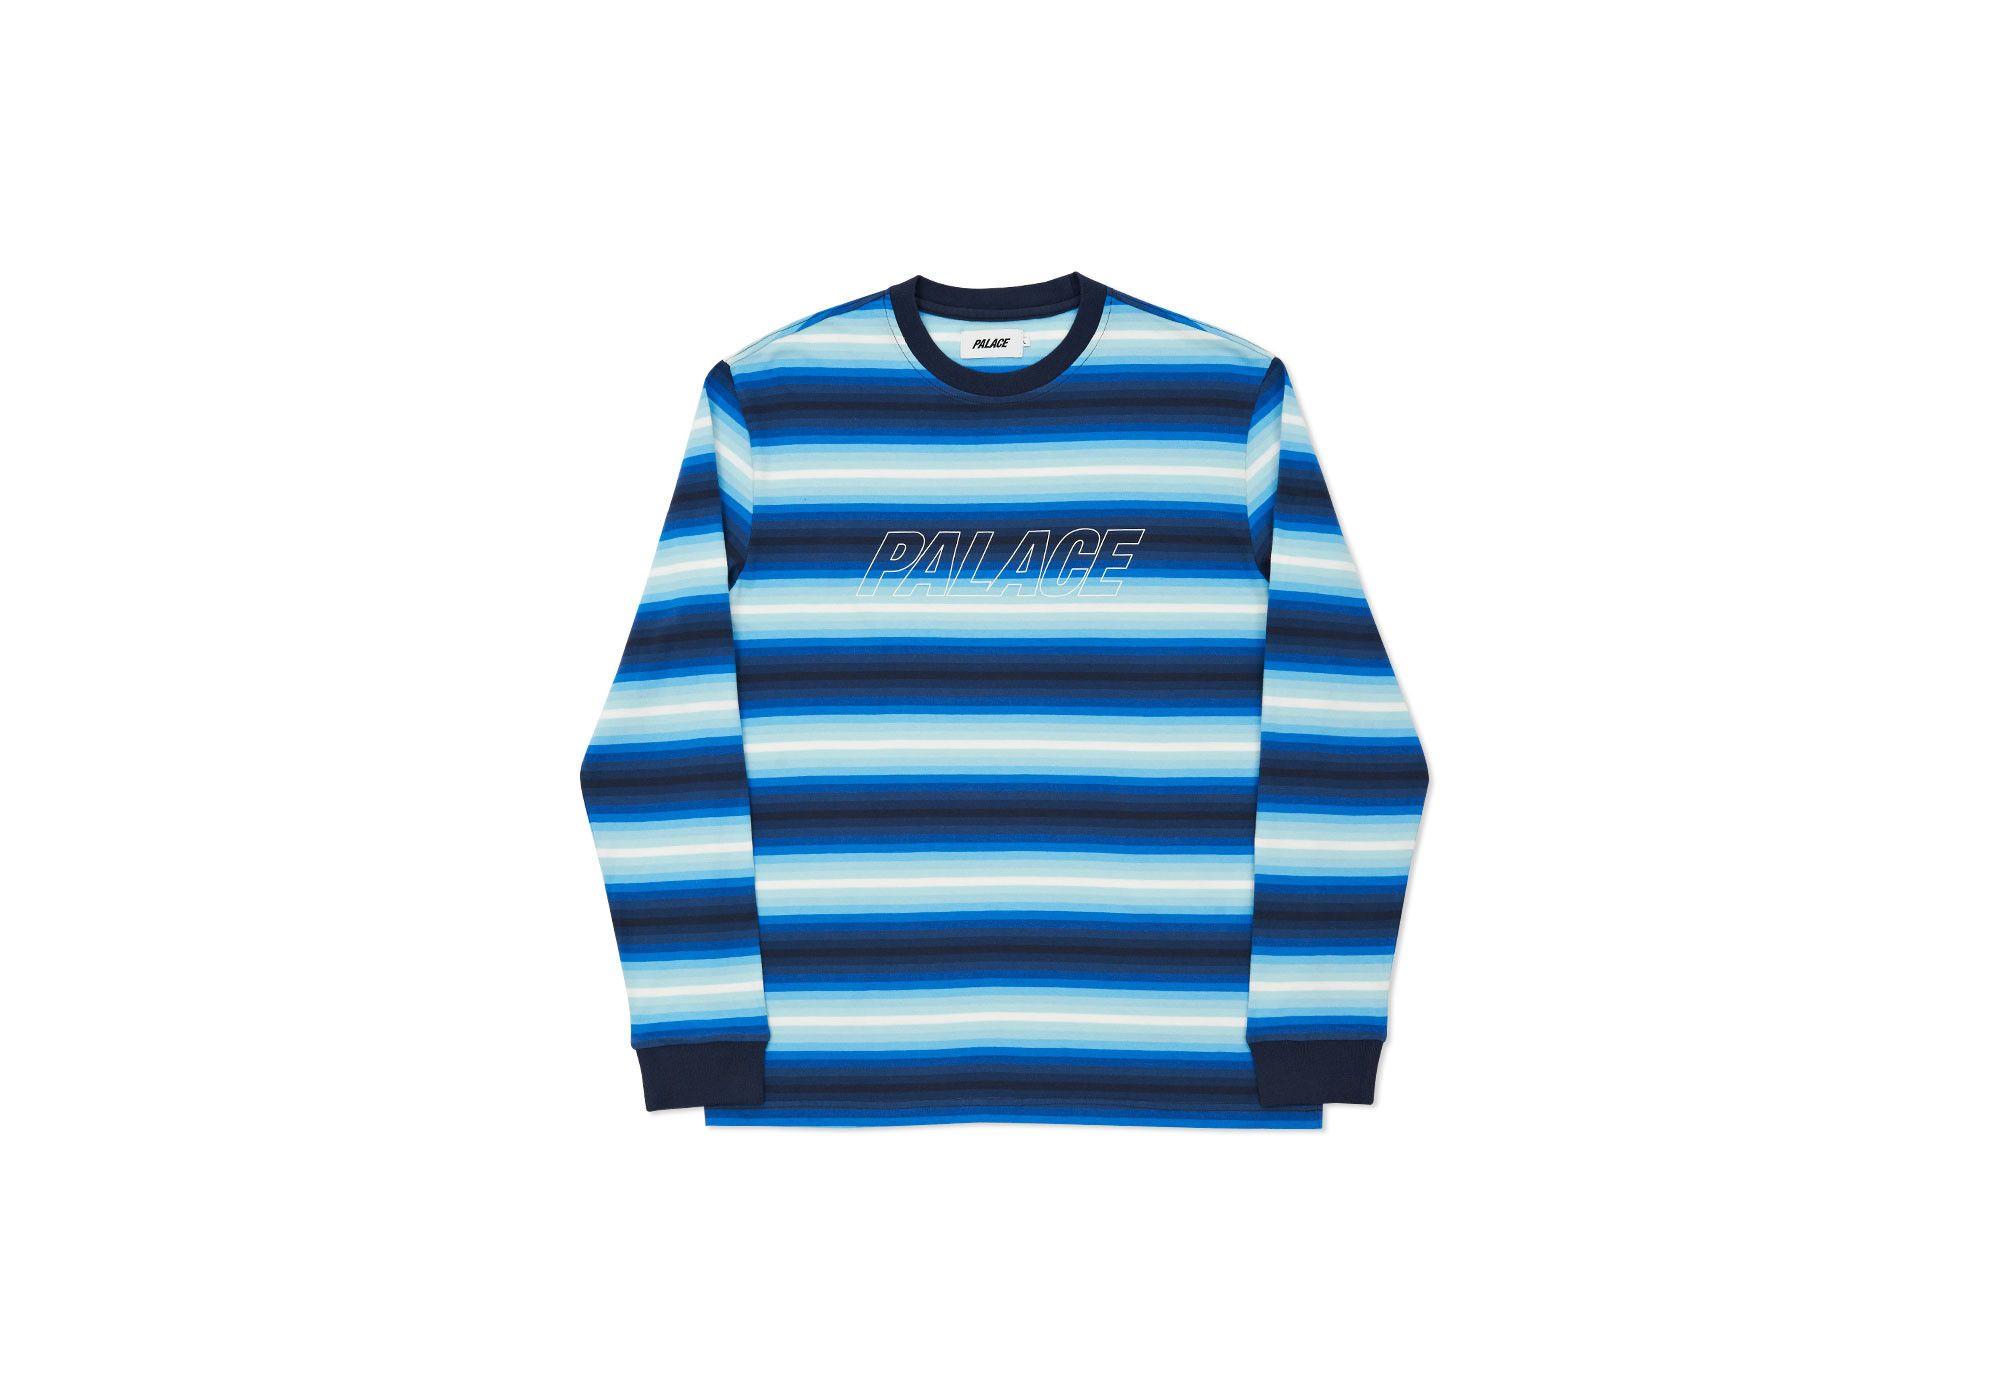 121b2f6ddb PALACE SKATEBOARDS FADER STRIPE TOP BLUES | On Streetwear | Winter ...